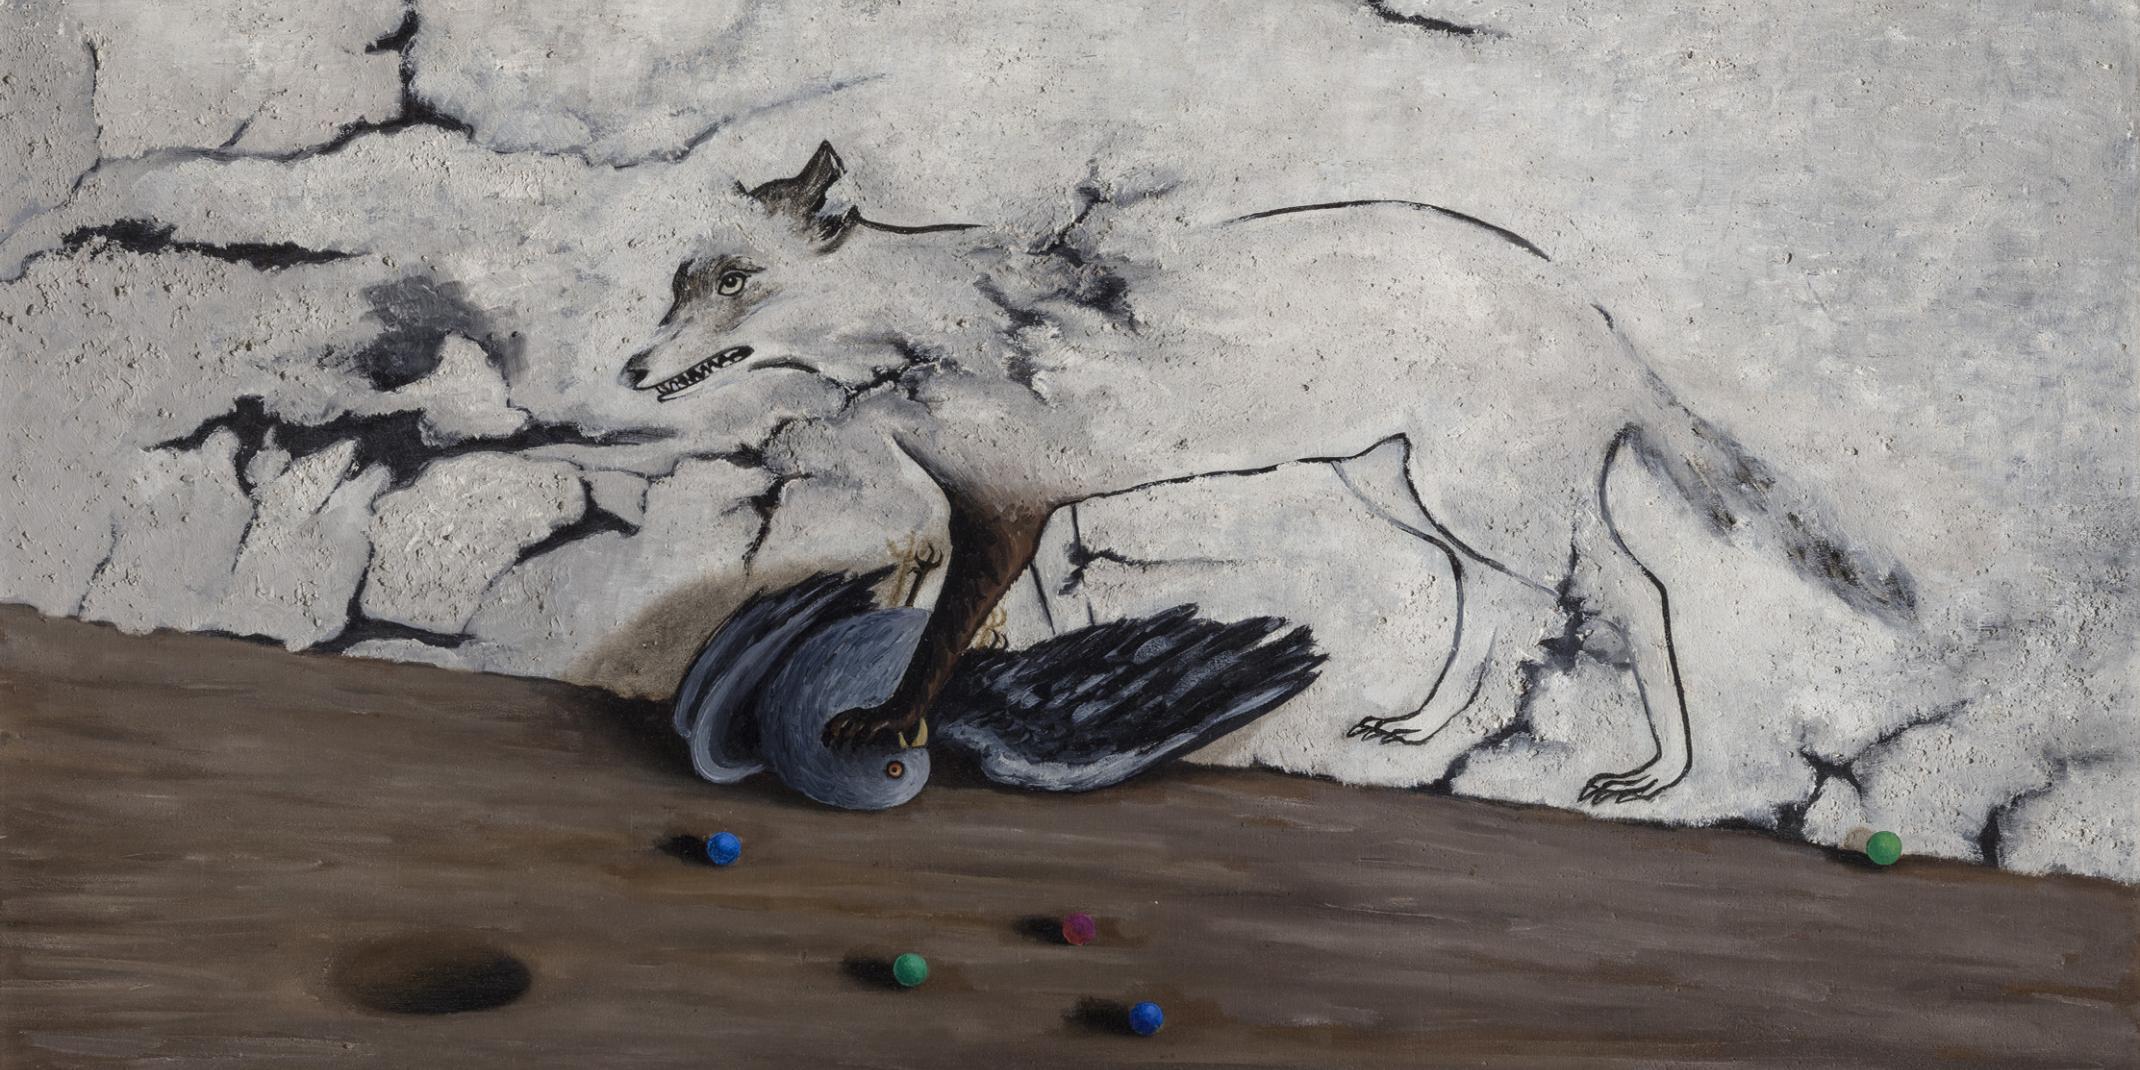 TOYEN (1902-1980) Na zámku La Coste / Im Schloss La Coste / At La Coste Castle, 1943 Öl auf Leinwand, 65 x 87 cm National Gallery in Prague © VG Bild-Kunst, Bonn 2021 Foto: © National Gallery Prague 2021